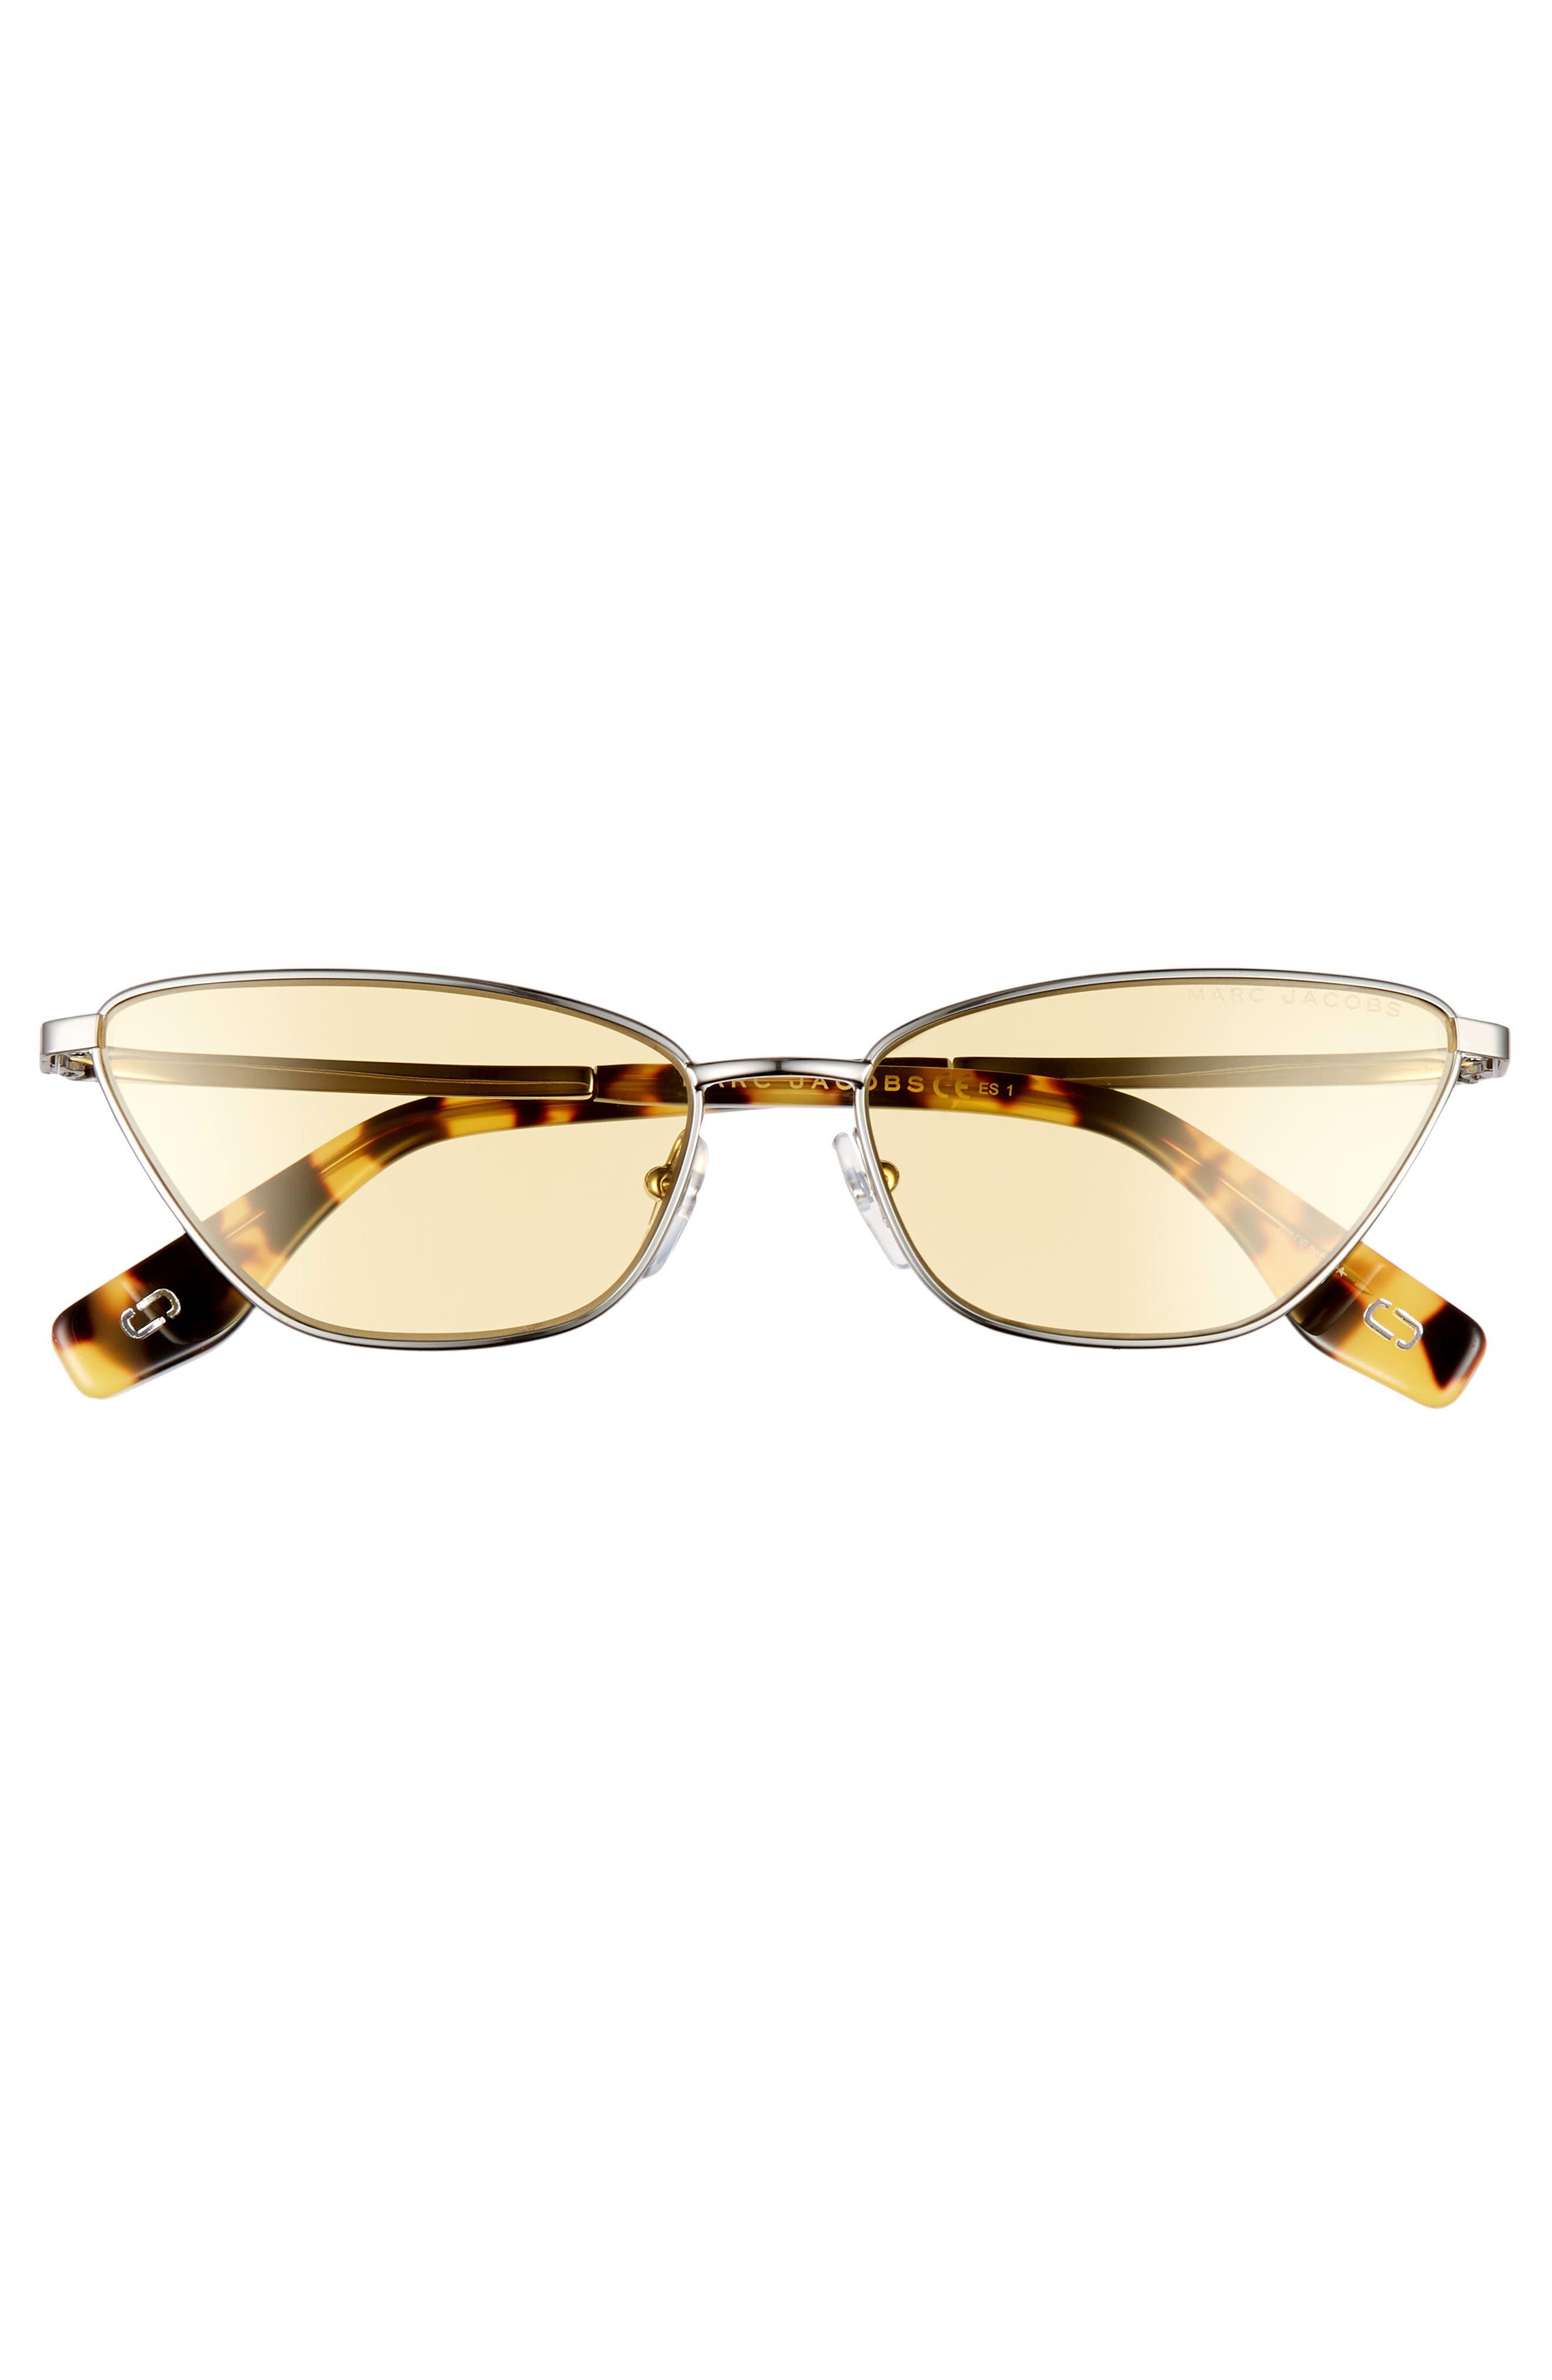 57mm Cat Eye Sunglasses,                             Alternate thumbnail 3, color,                             SILVER/ YELLOW